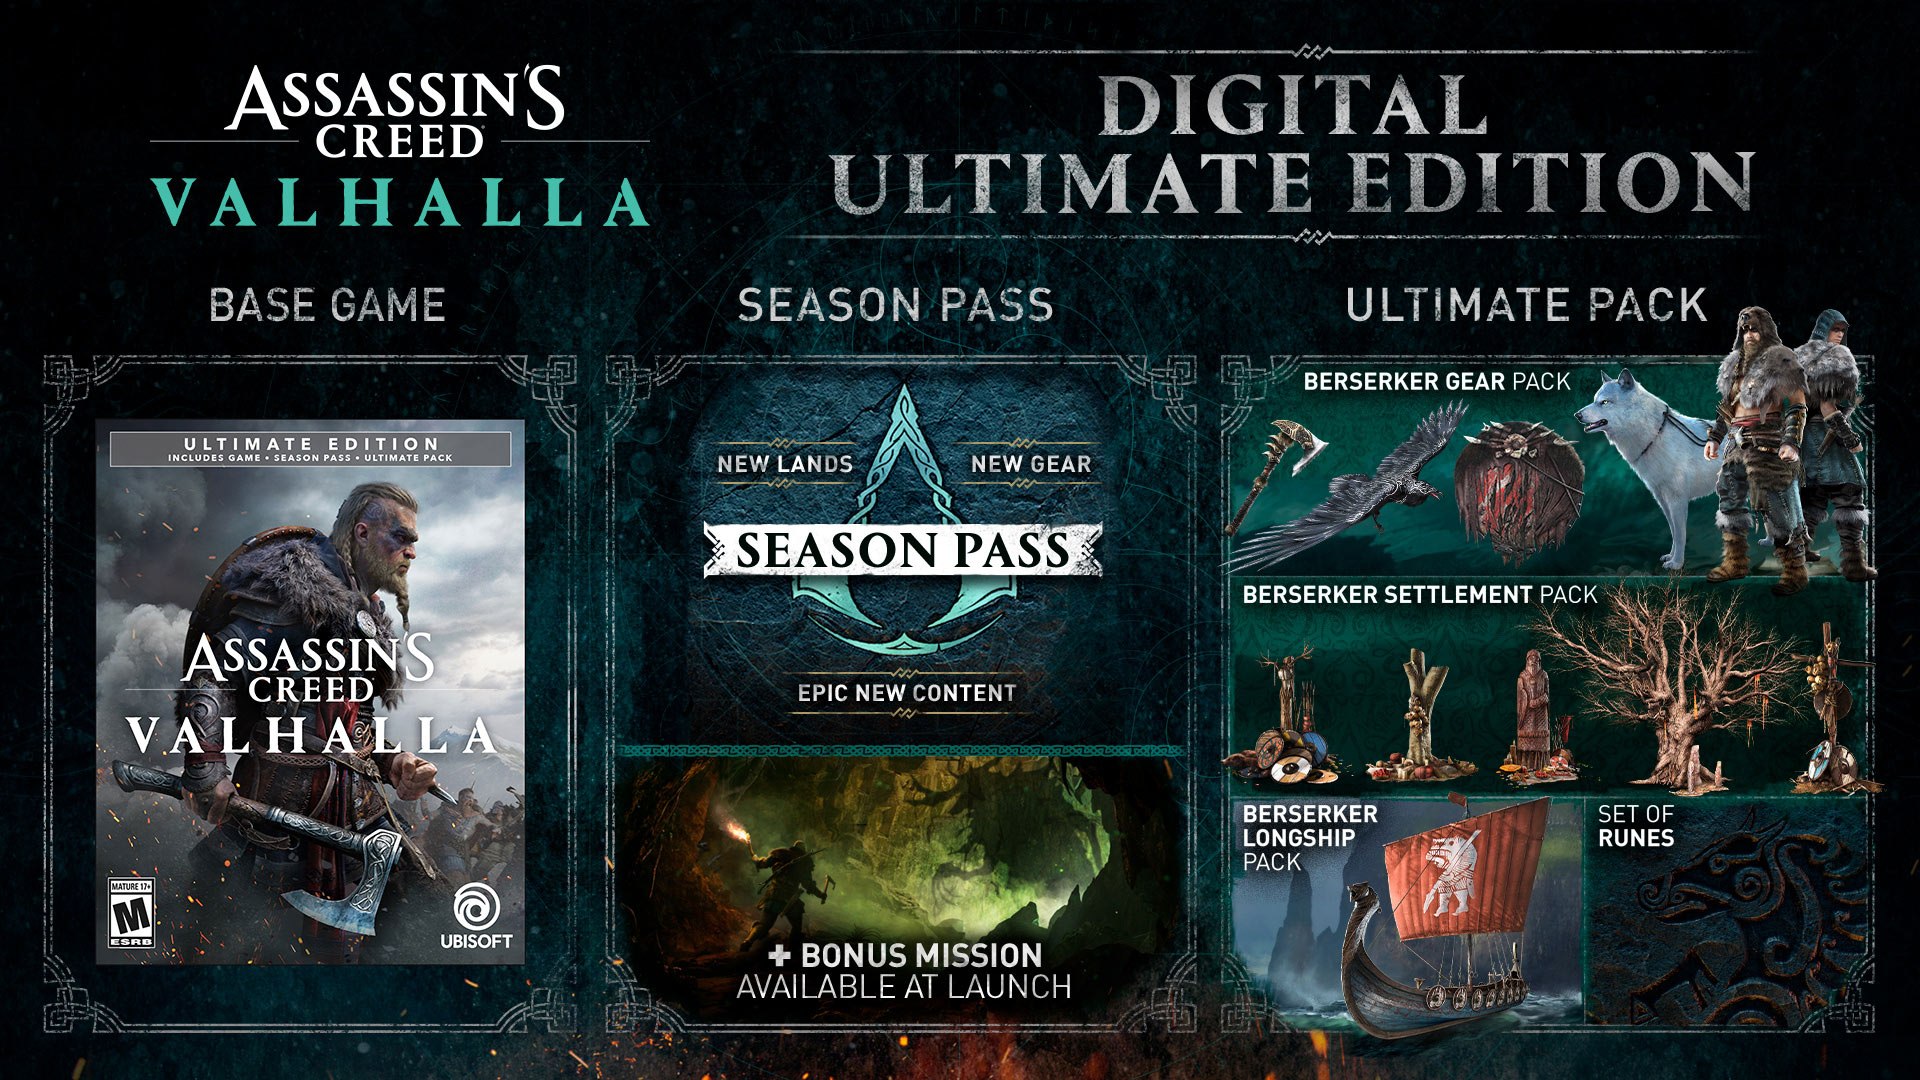 Acheter Assassin S Creed Valhalla Ultimate Edition Boutique Officielle Ubisoft Ca